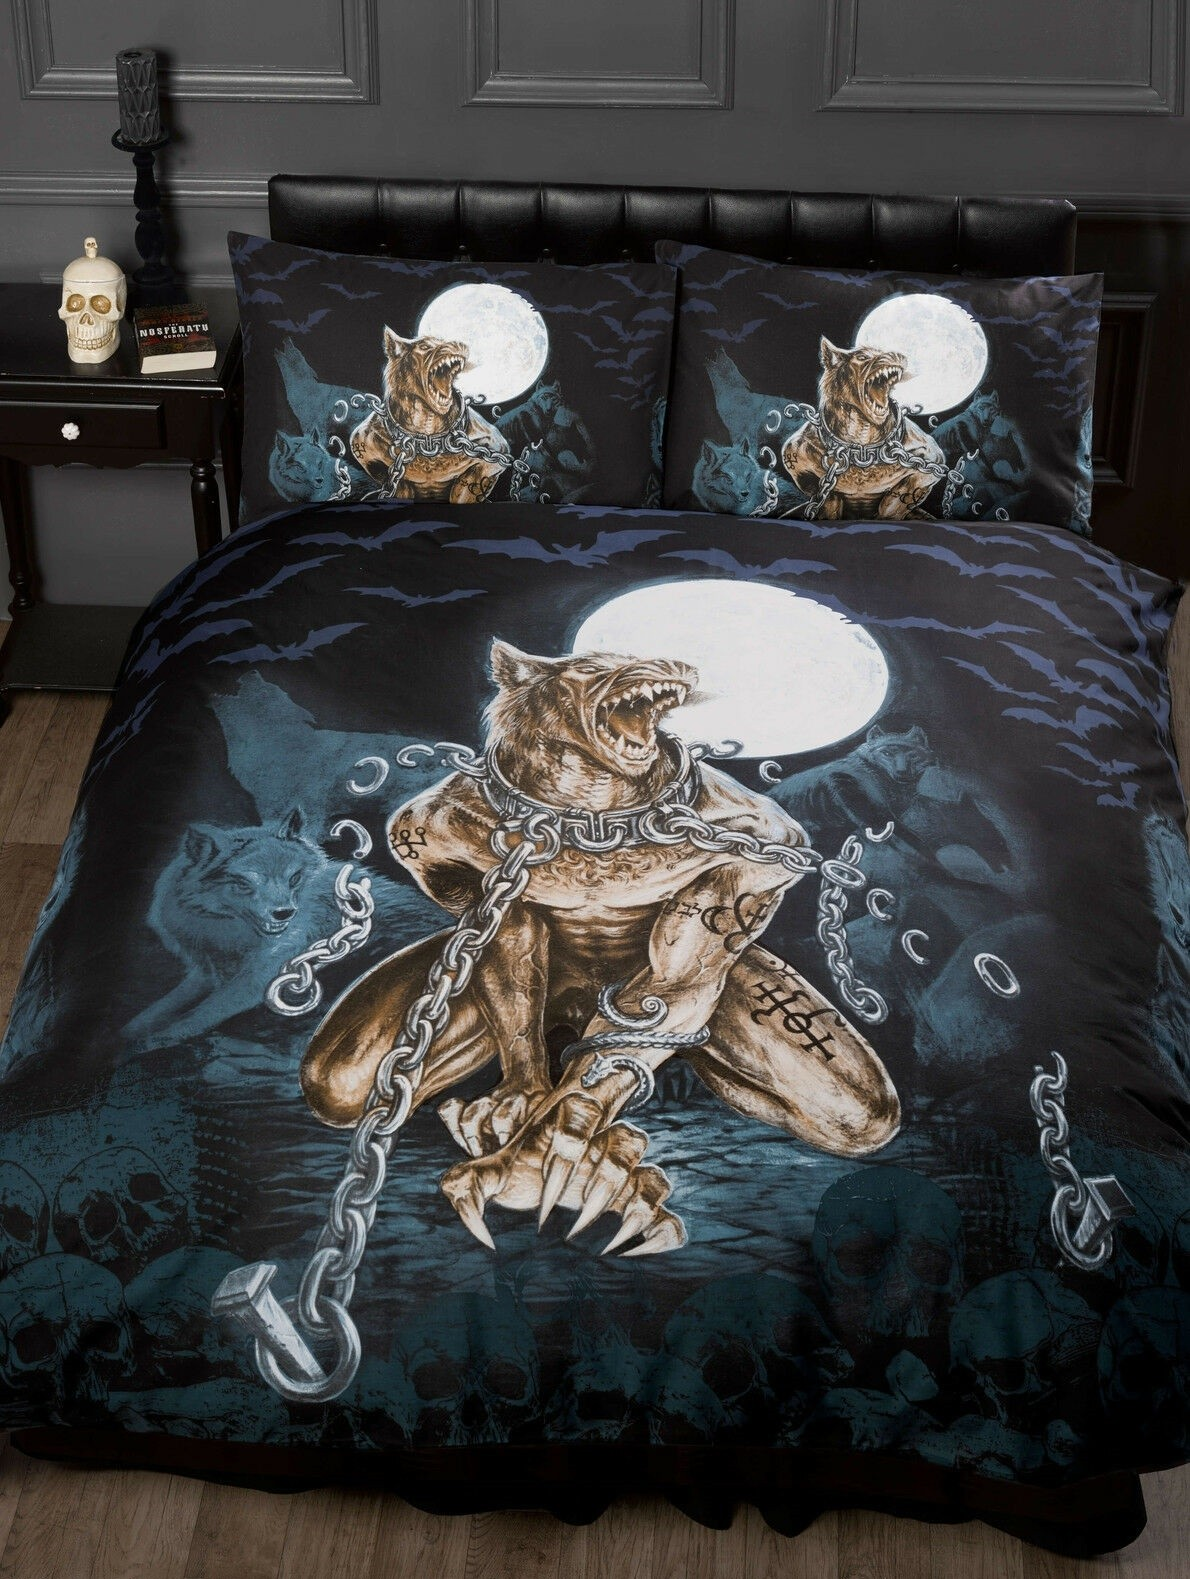 Single Size Alchemy Loups Garou Design Gothic Duvet Cover & Matching Pillowcases